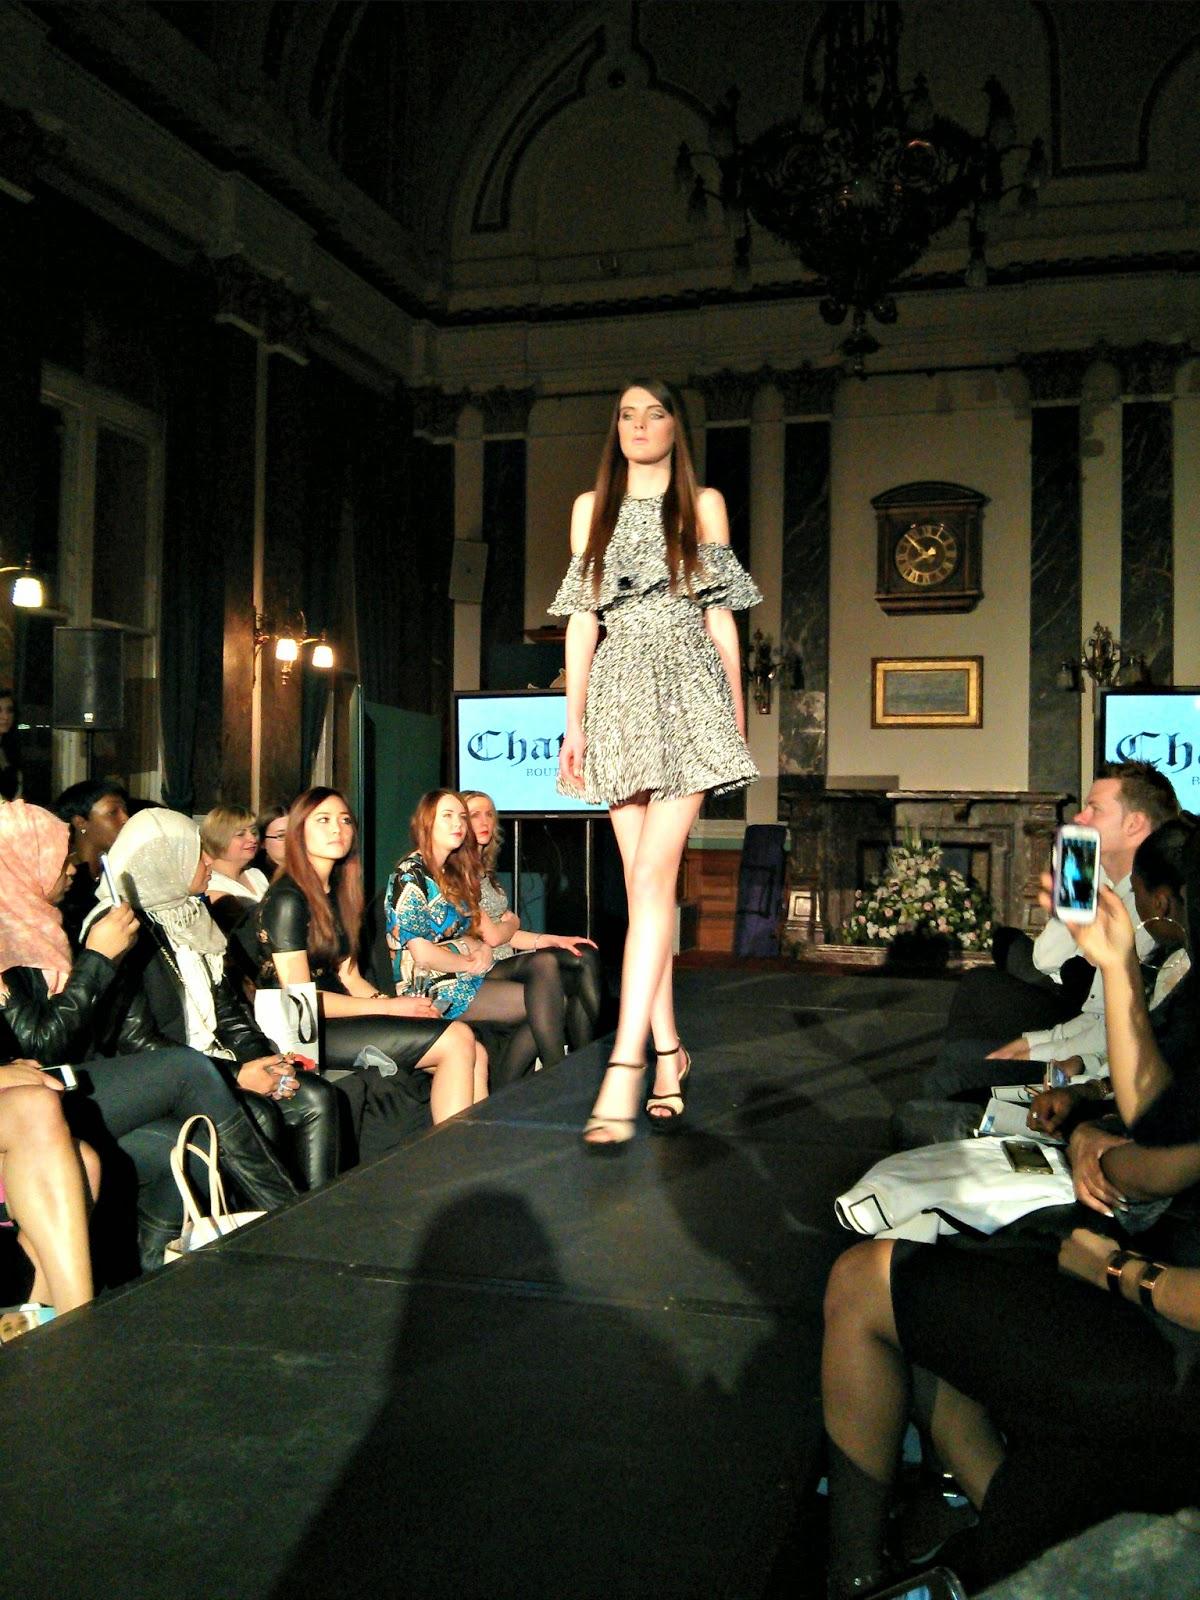 Chateau Butique Fashion Show